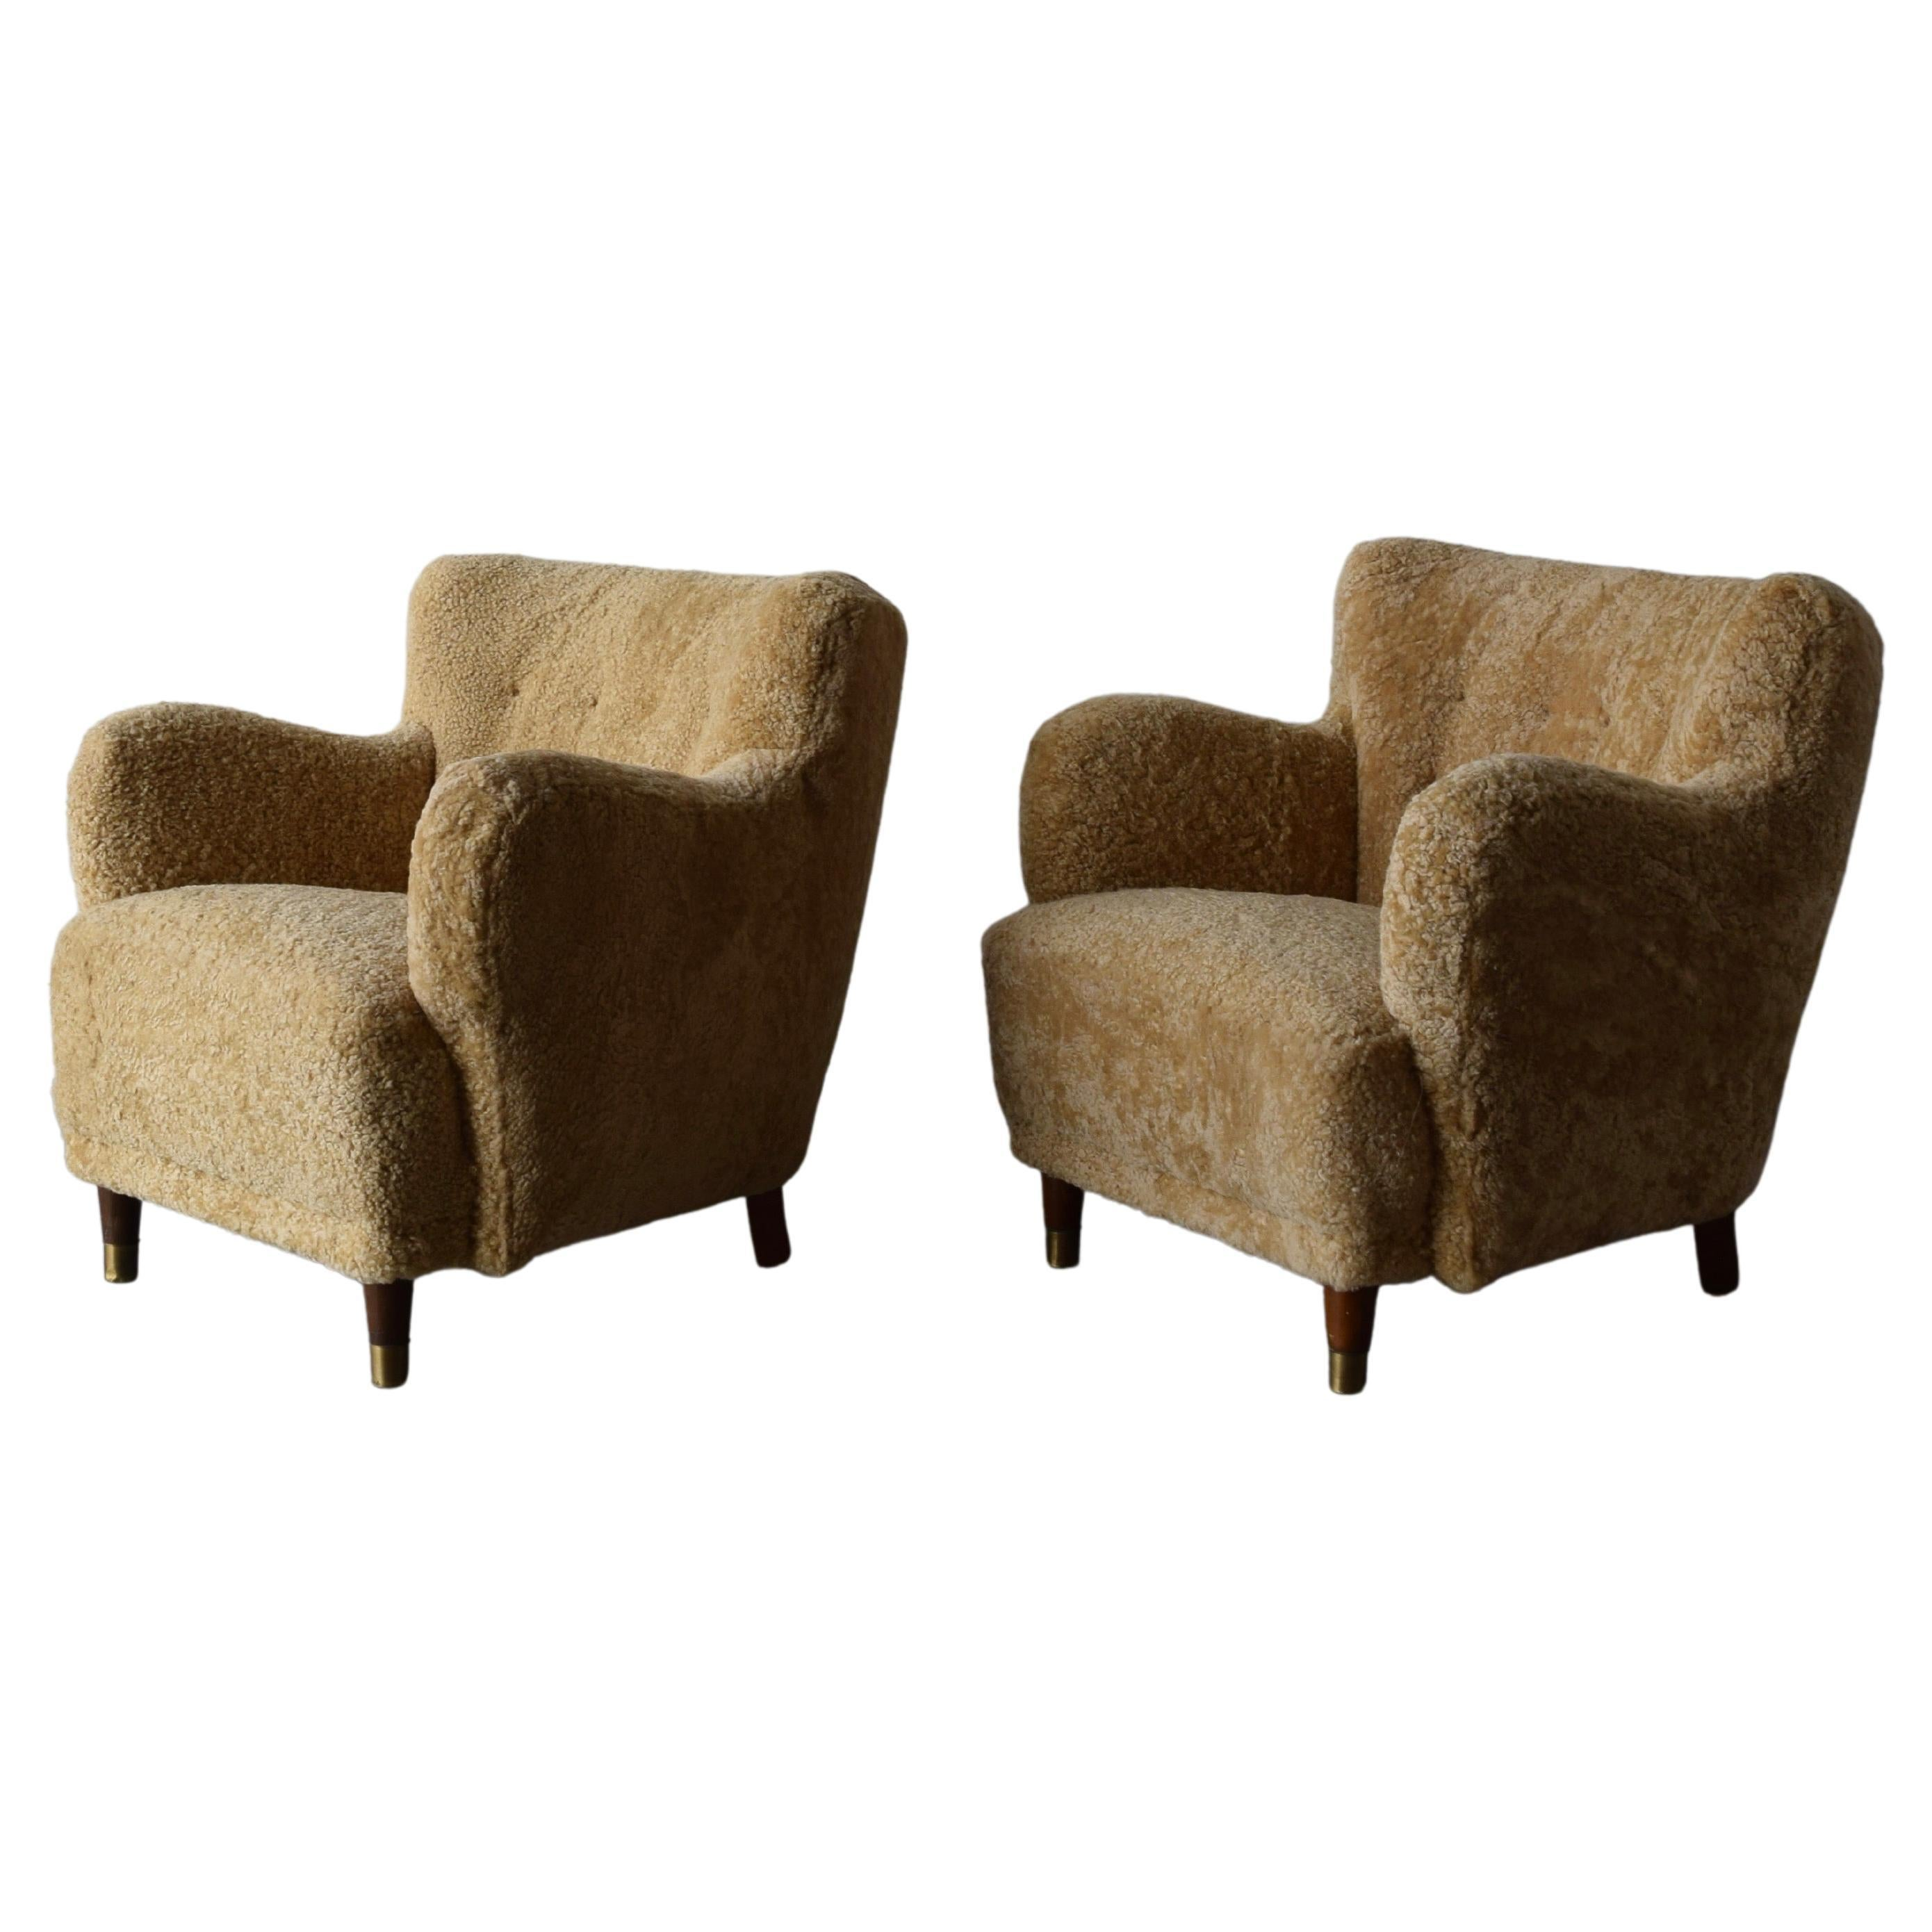 Danish Designer, Organic Lounge Chairs, Sheepskin, Wood, Brass, Denmark, 1940s